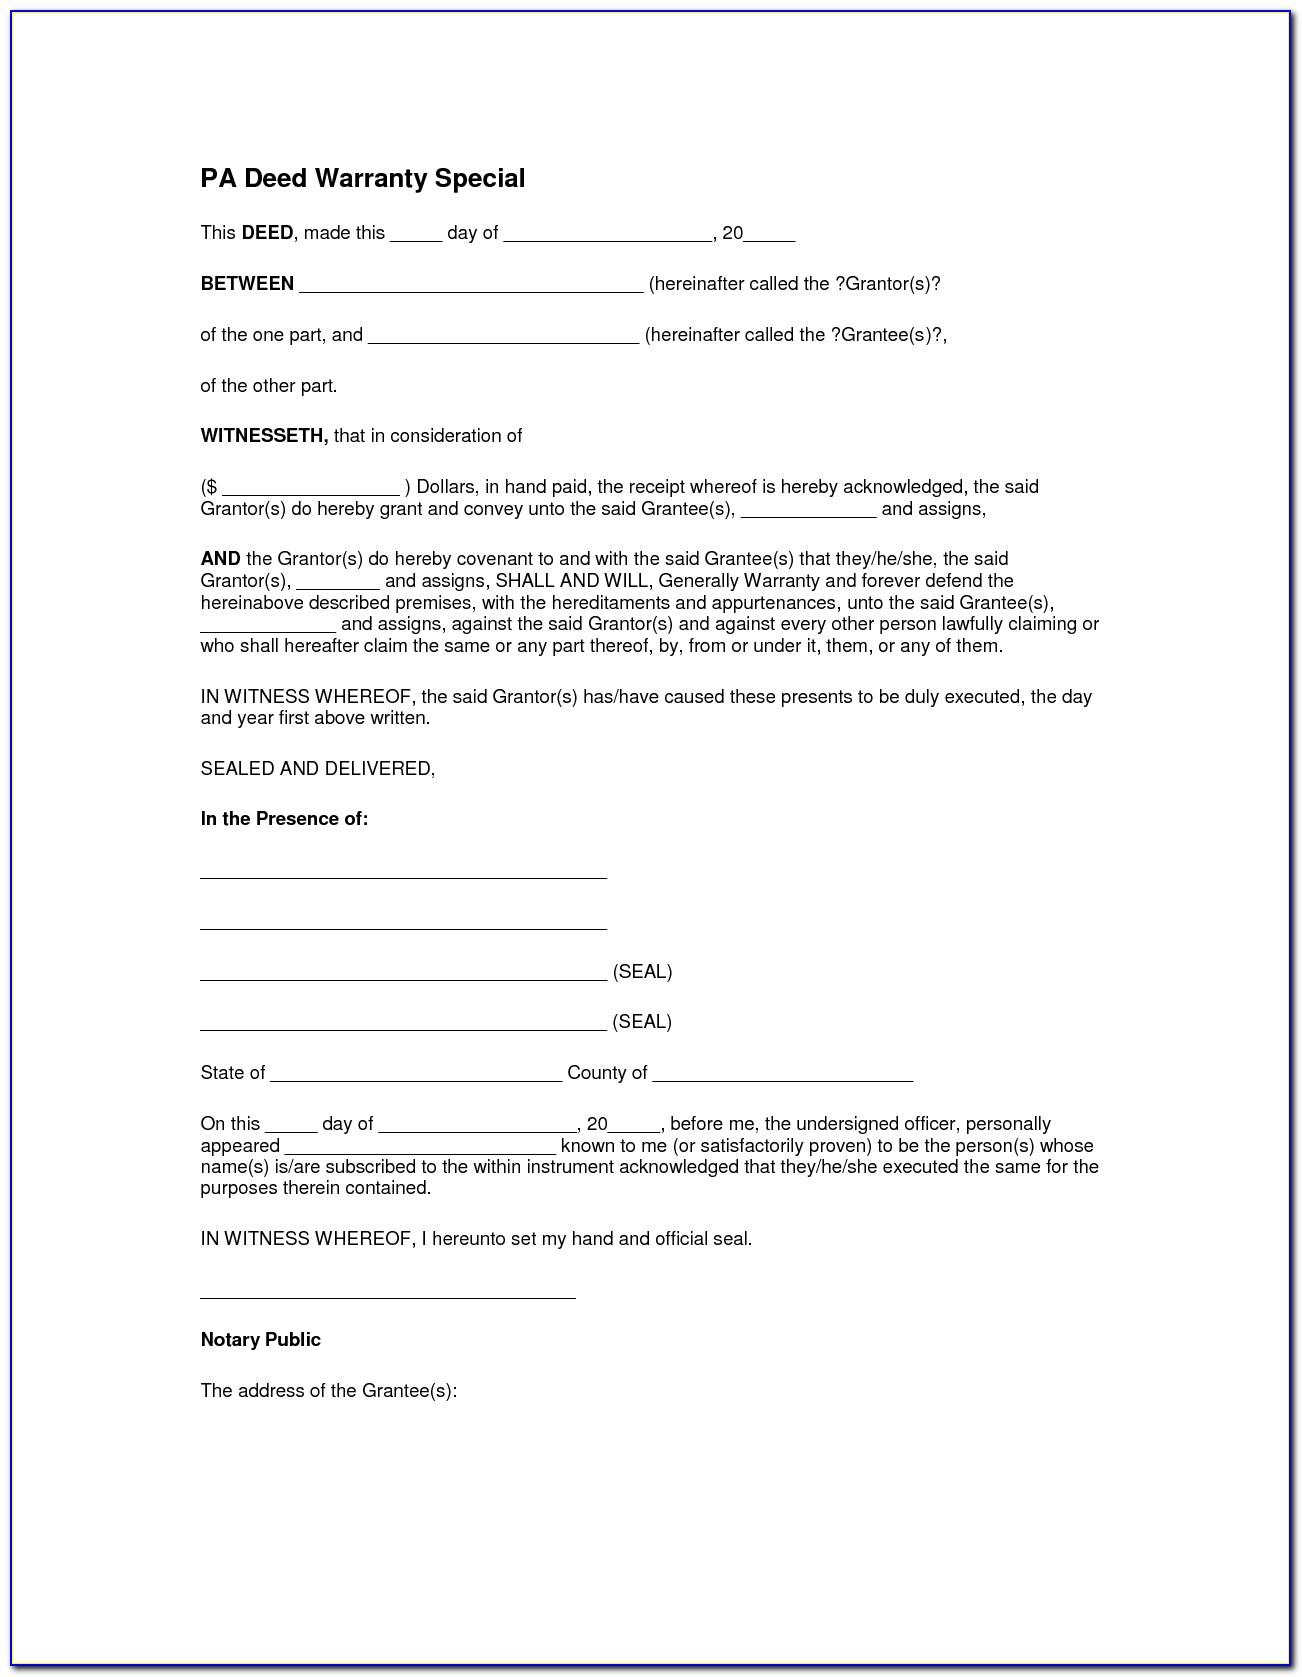 Lee County Florida Warranty Deed Form